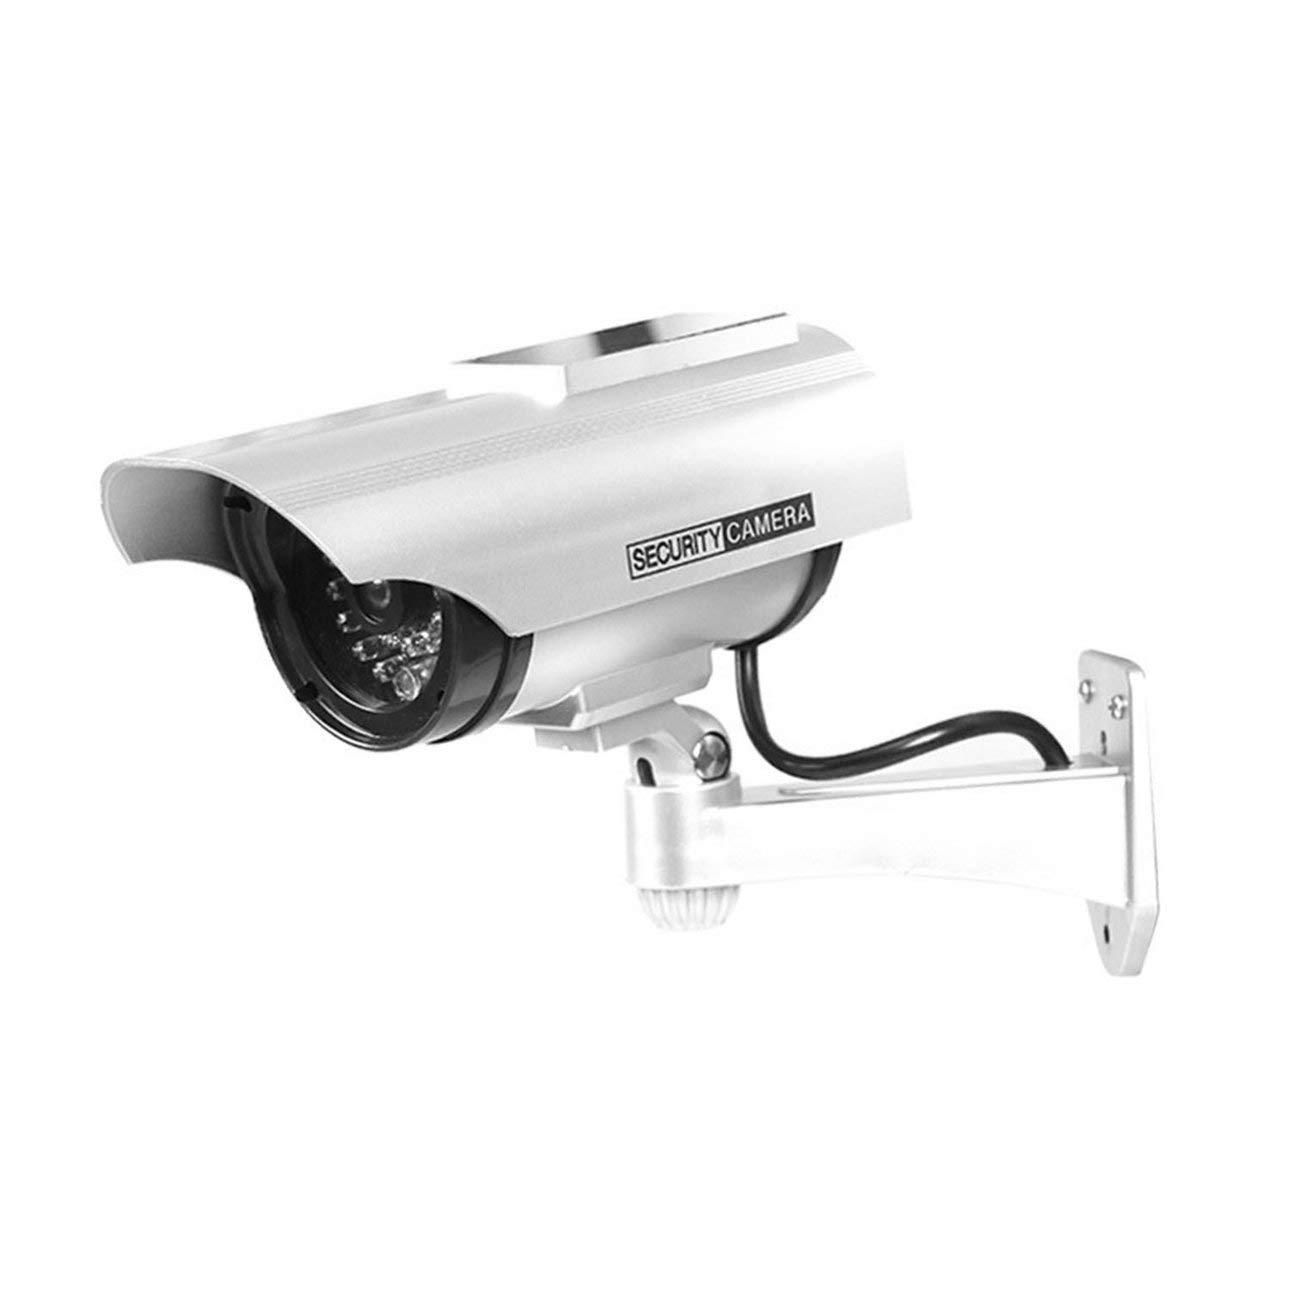 hengduolailin C/ámara de vigilancia Yz-3302 Solar Dummy Cctv Monitoreo de seguridad C/ámara falsa a prueba de agua Luz intermitente Rojo Led Luz C/ámara de seguridad de video